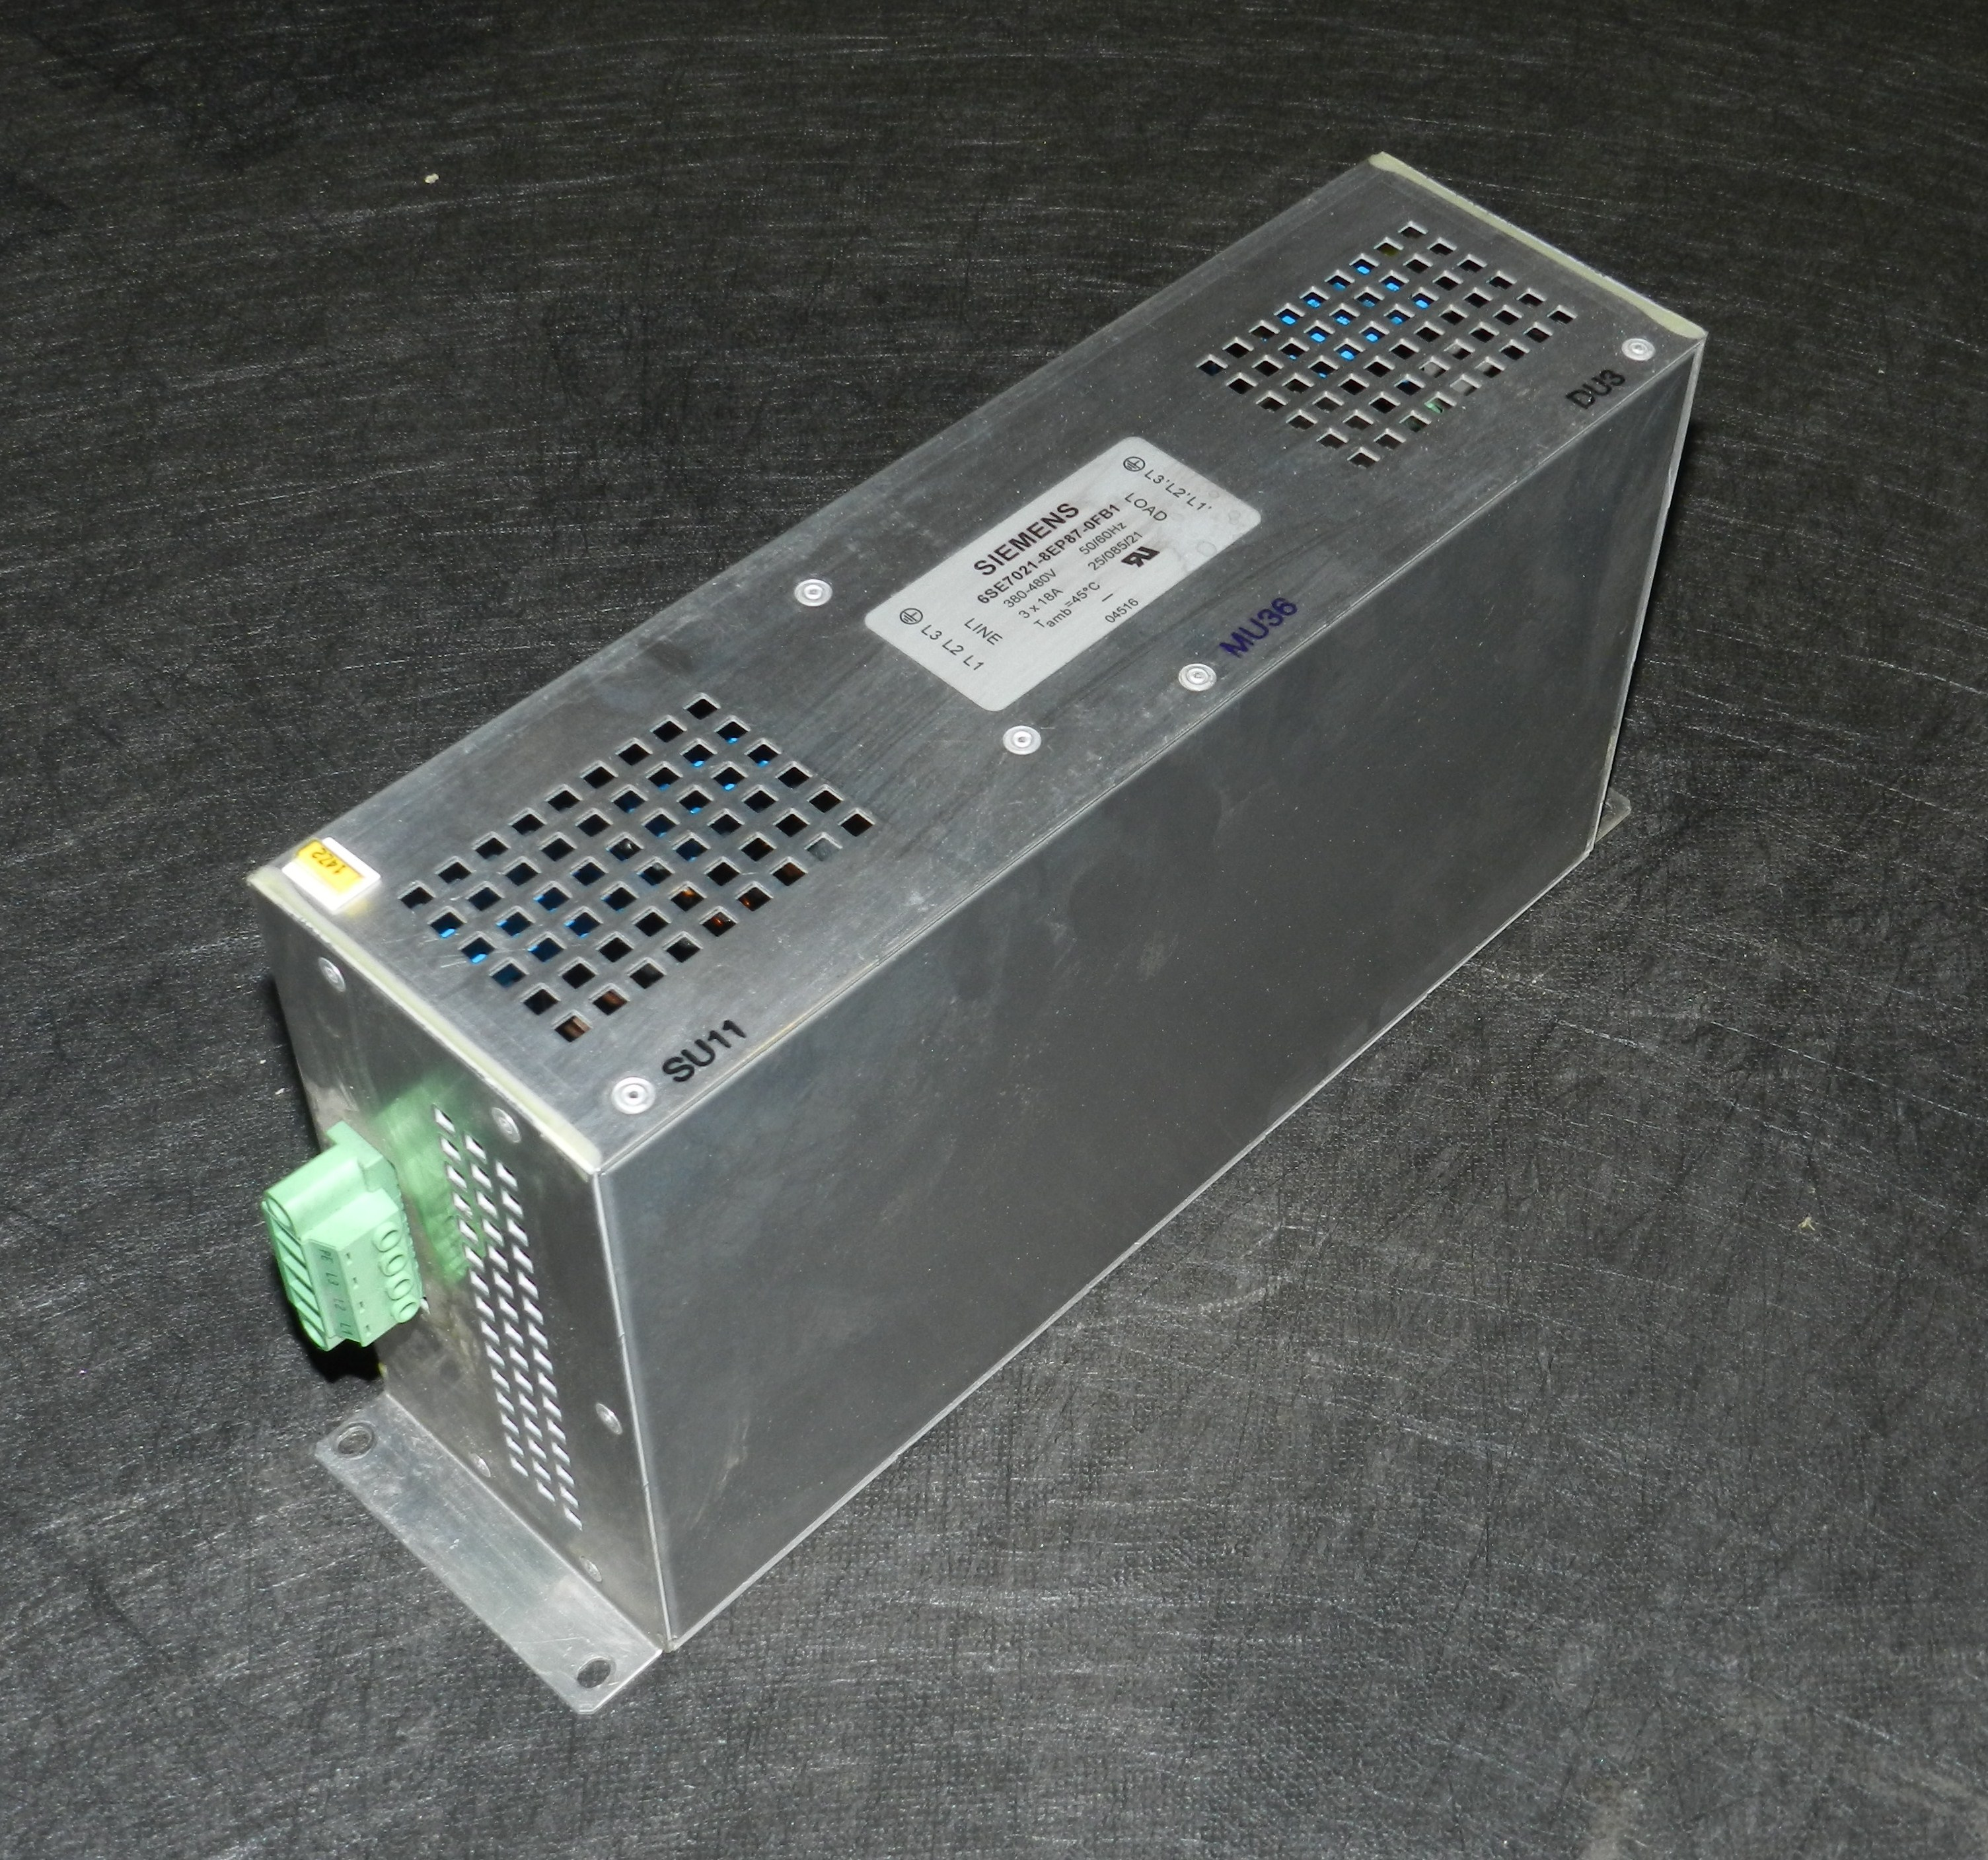 Lot 20 - Siemens 6SE7021-8EP87-0FB1 Simovert Master Drive Compact Plus EMC Filter